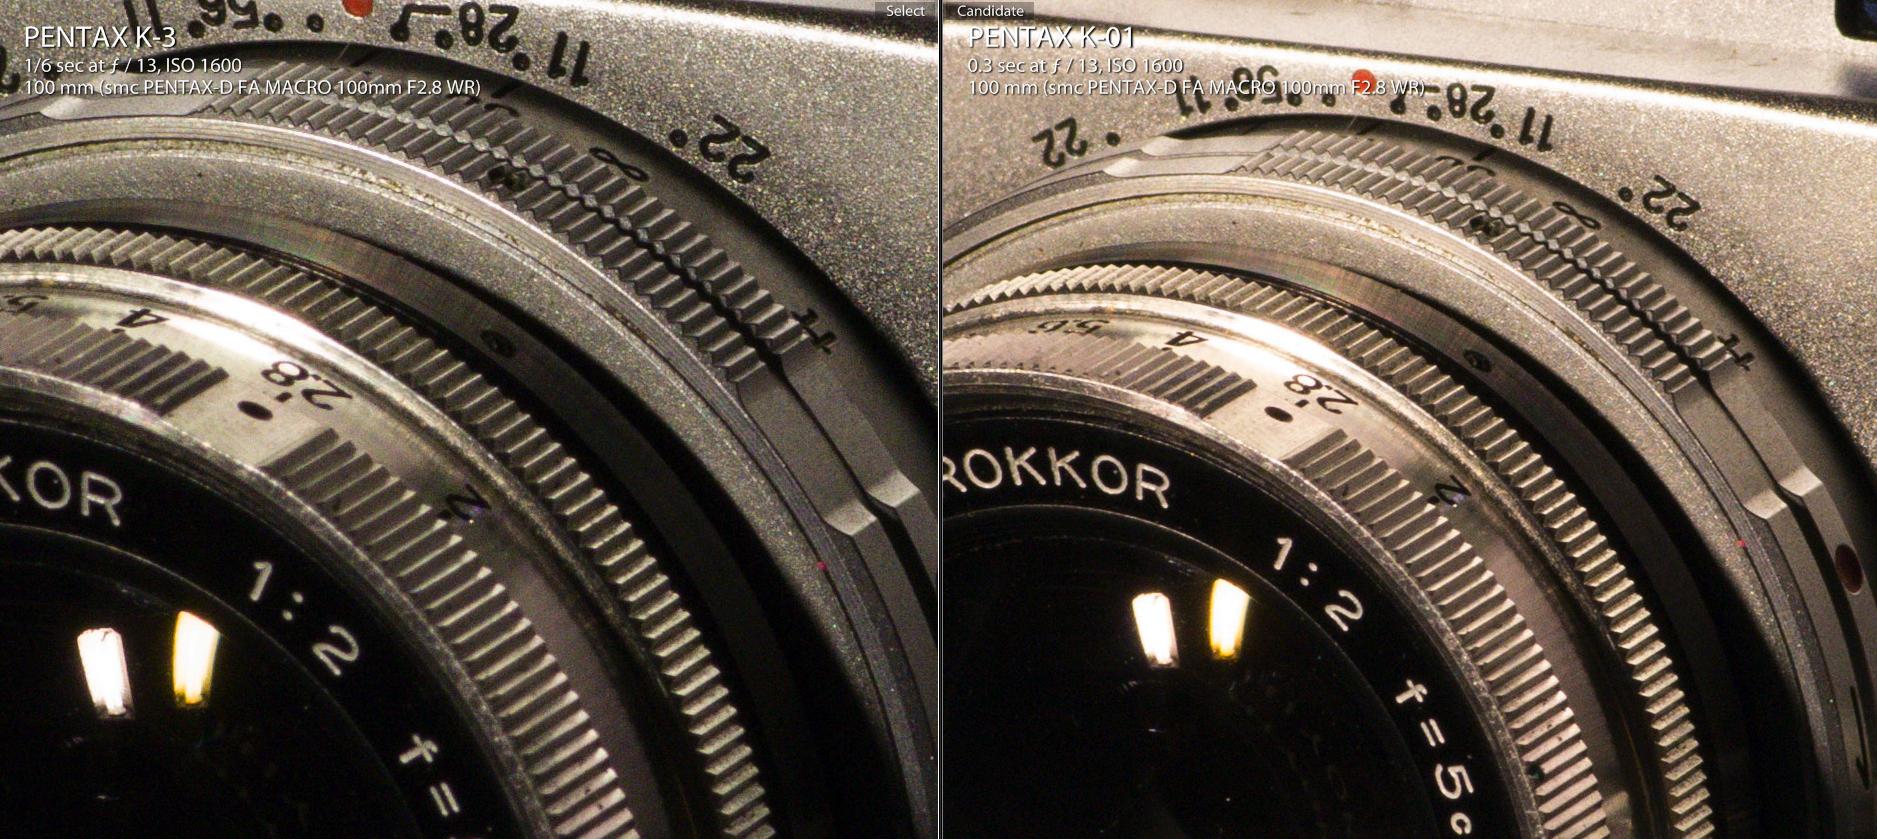 PentaxK3vsK01_1600ISO